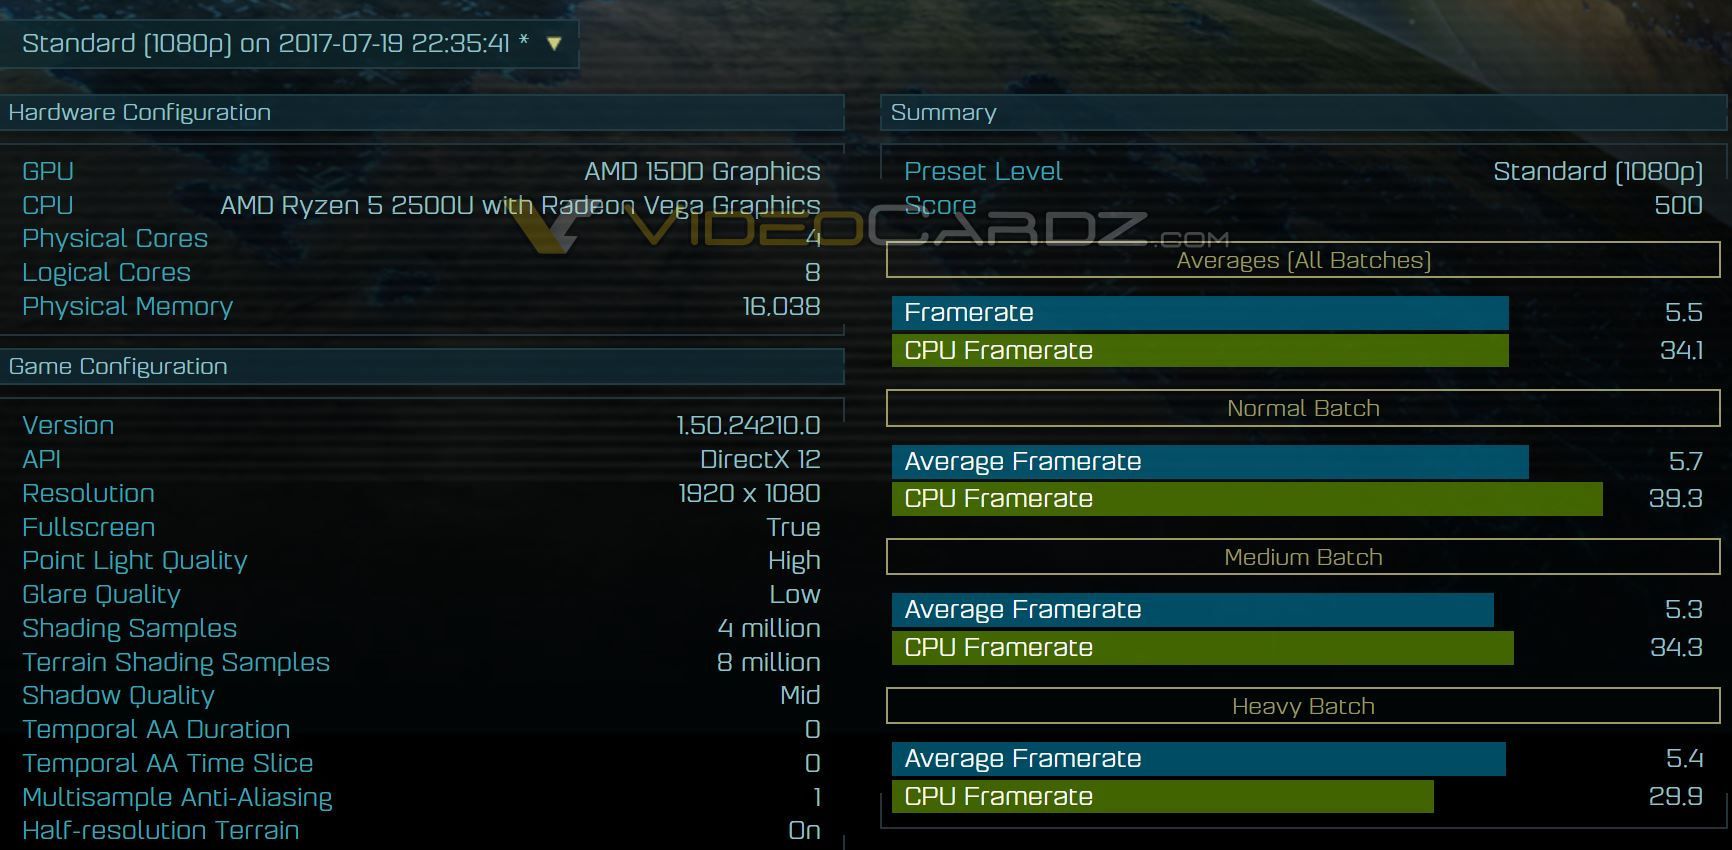 AMD Ryzen 5 2500U with Radeon Vega Graphics spotted | VideoCardz com